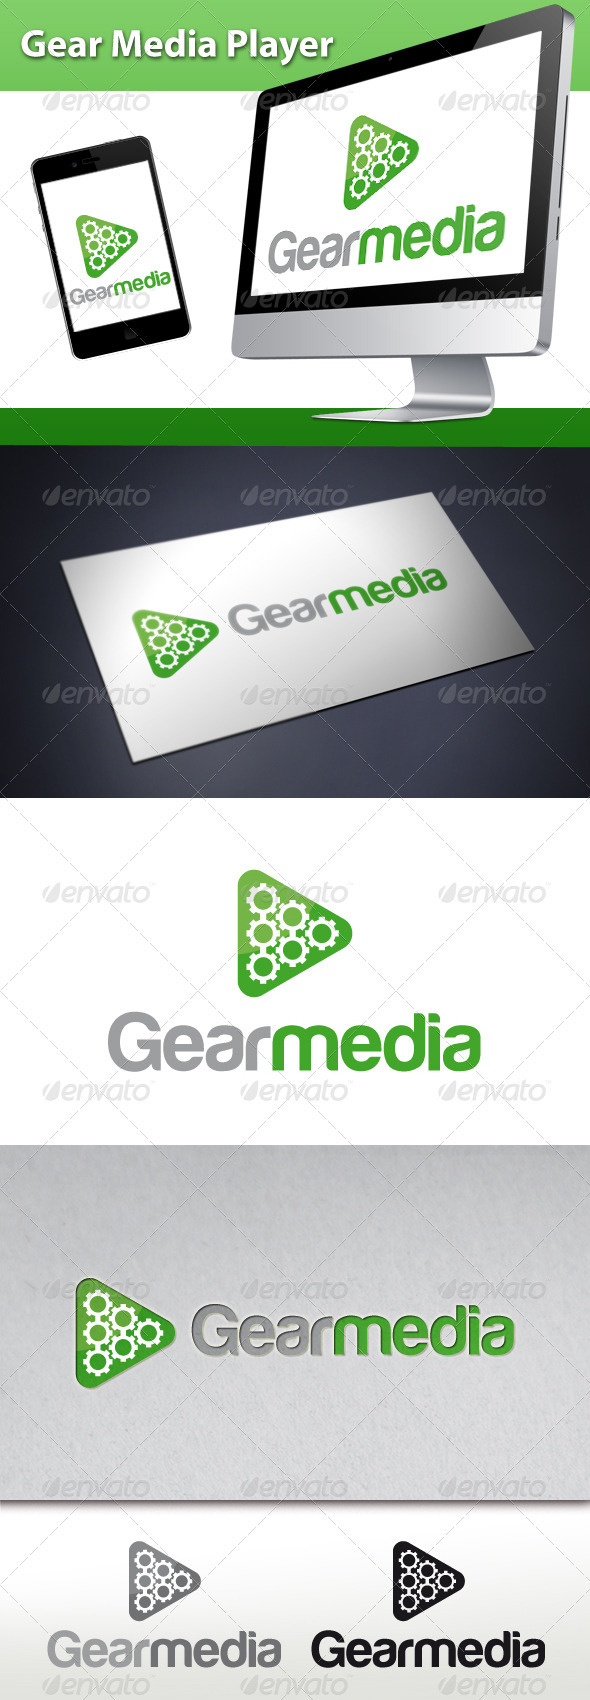 GraphicRiver Gear Media Player Logo 3494817